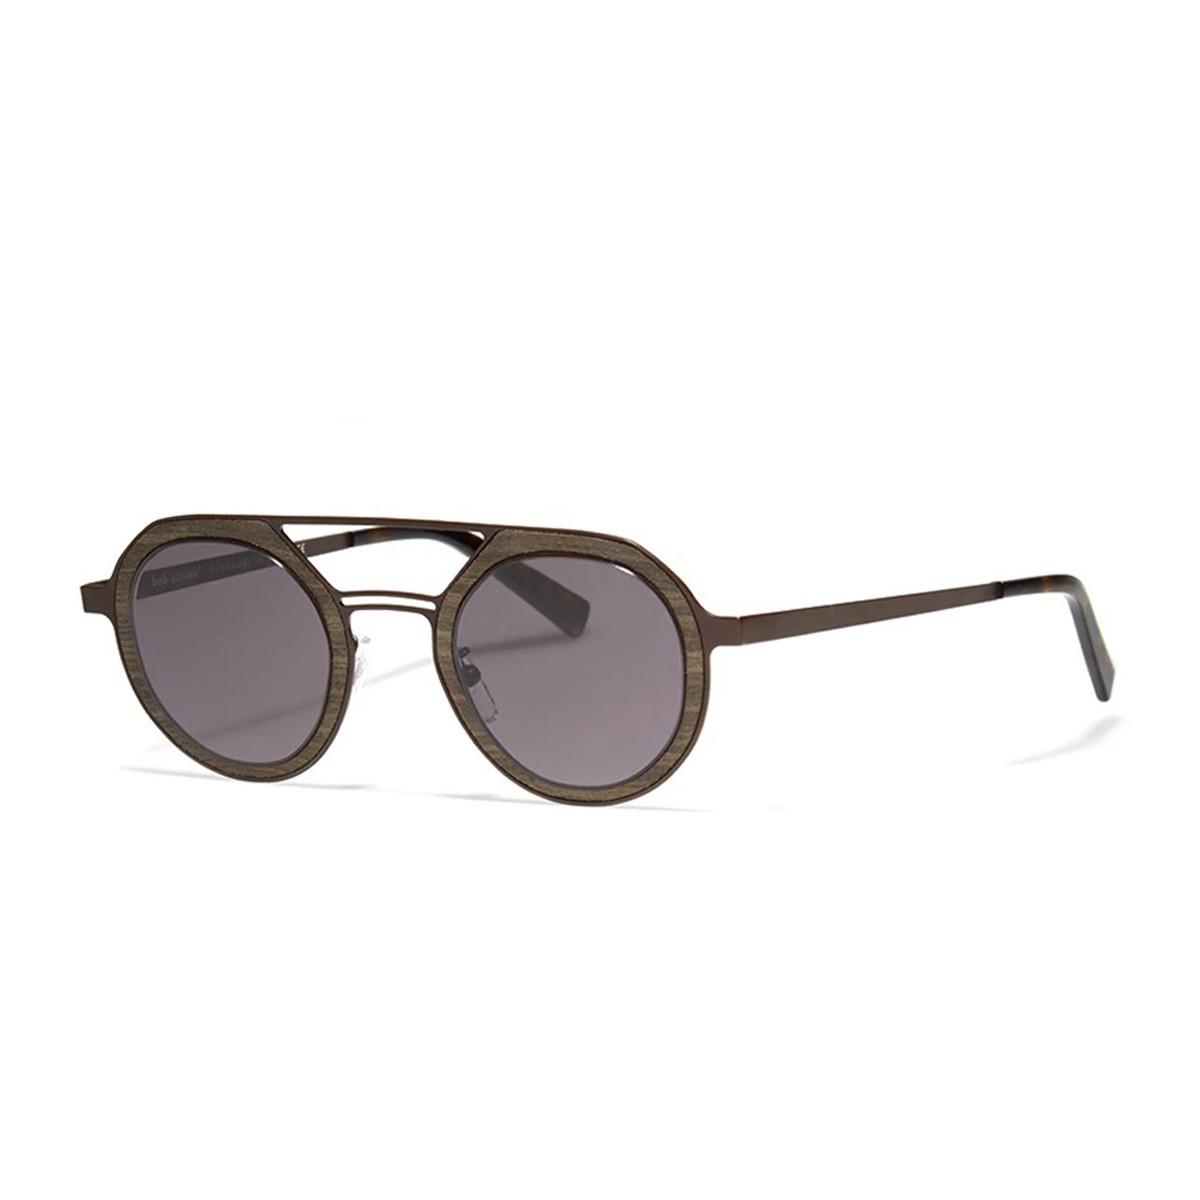 Bob Sdrunk Noah/s | Unisex sunglasses